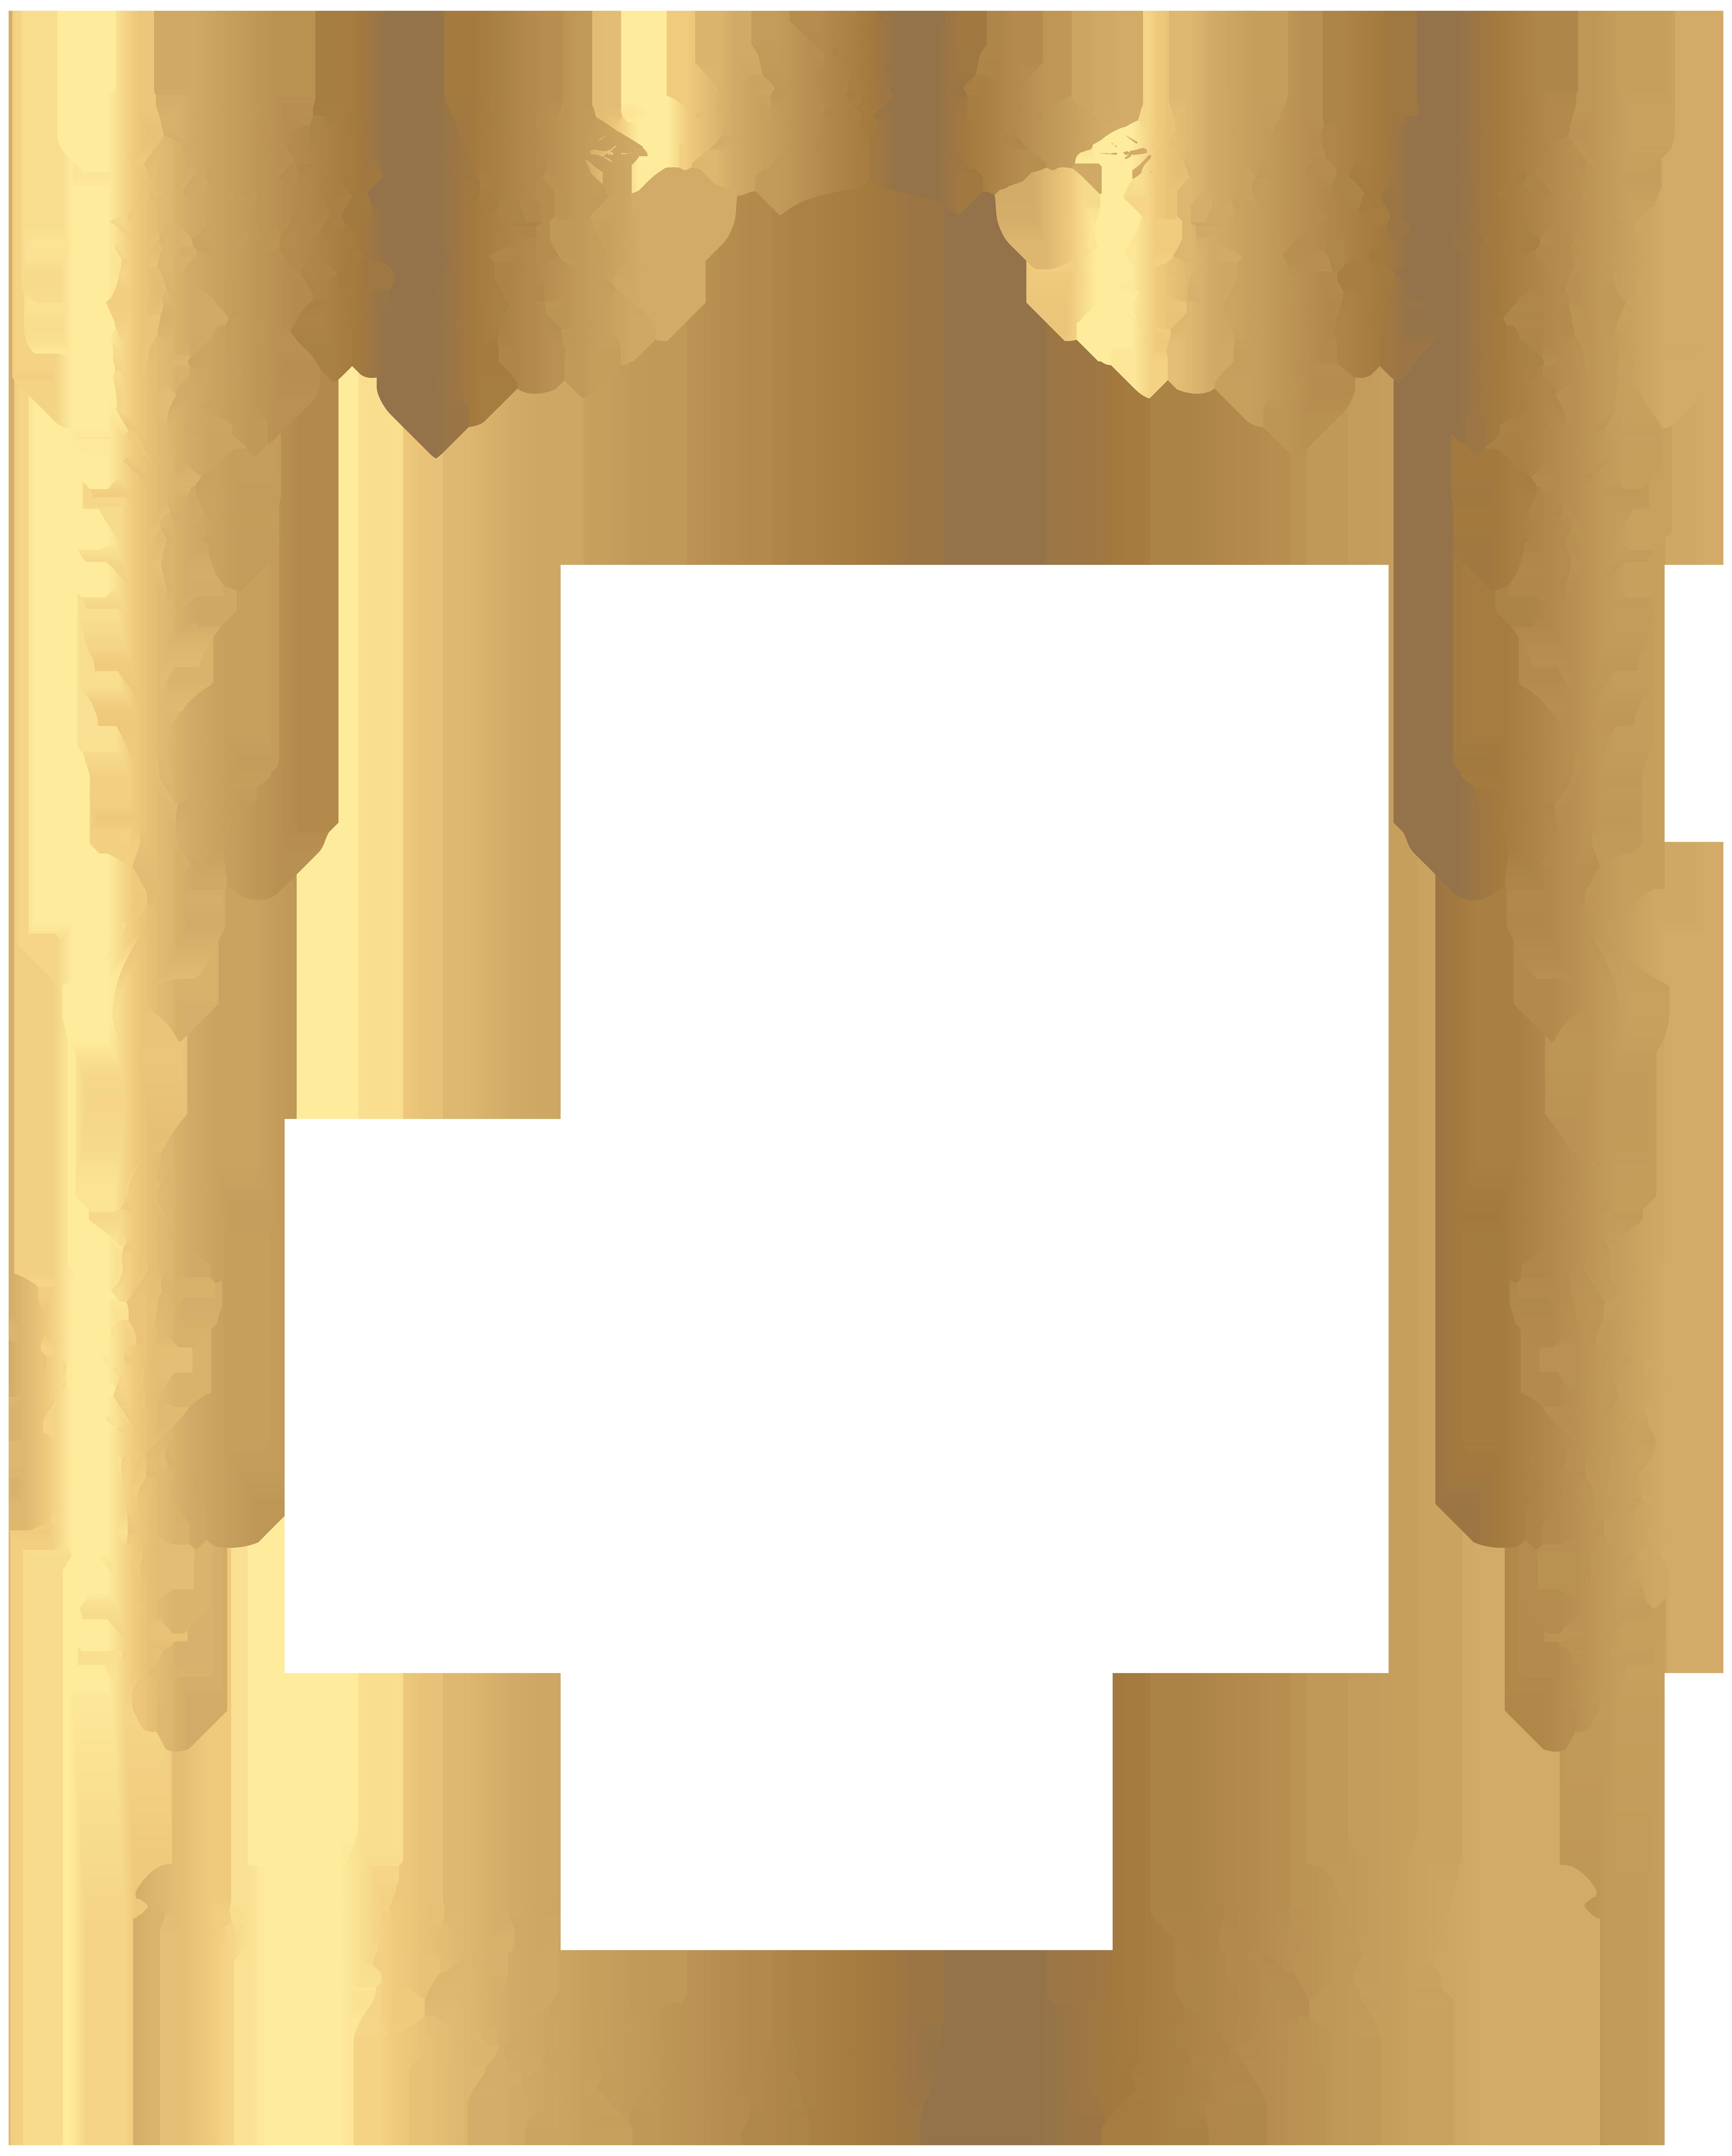 Decorative Rose Frame PNG Clip Art Image | B&F-Goldy | Pinterest ...